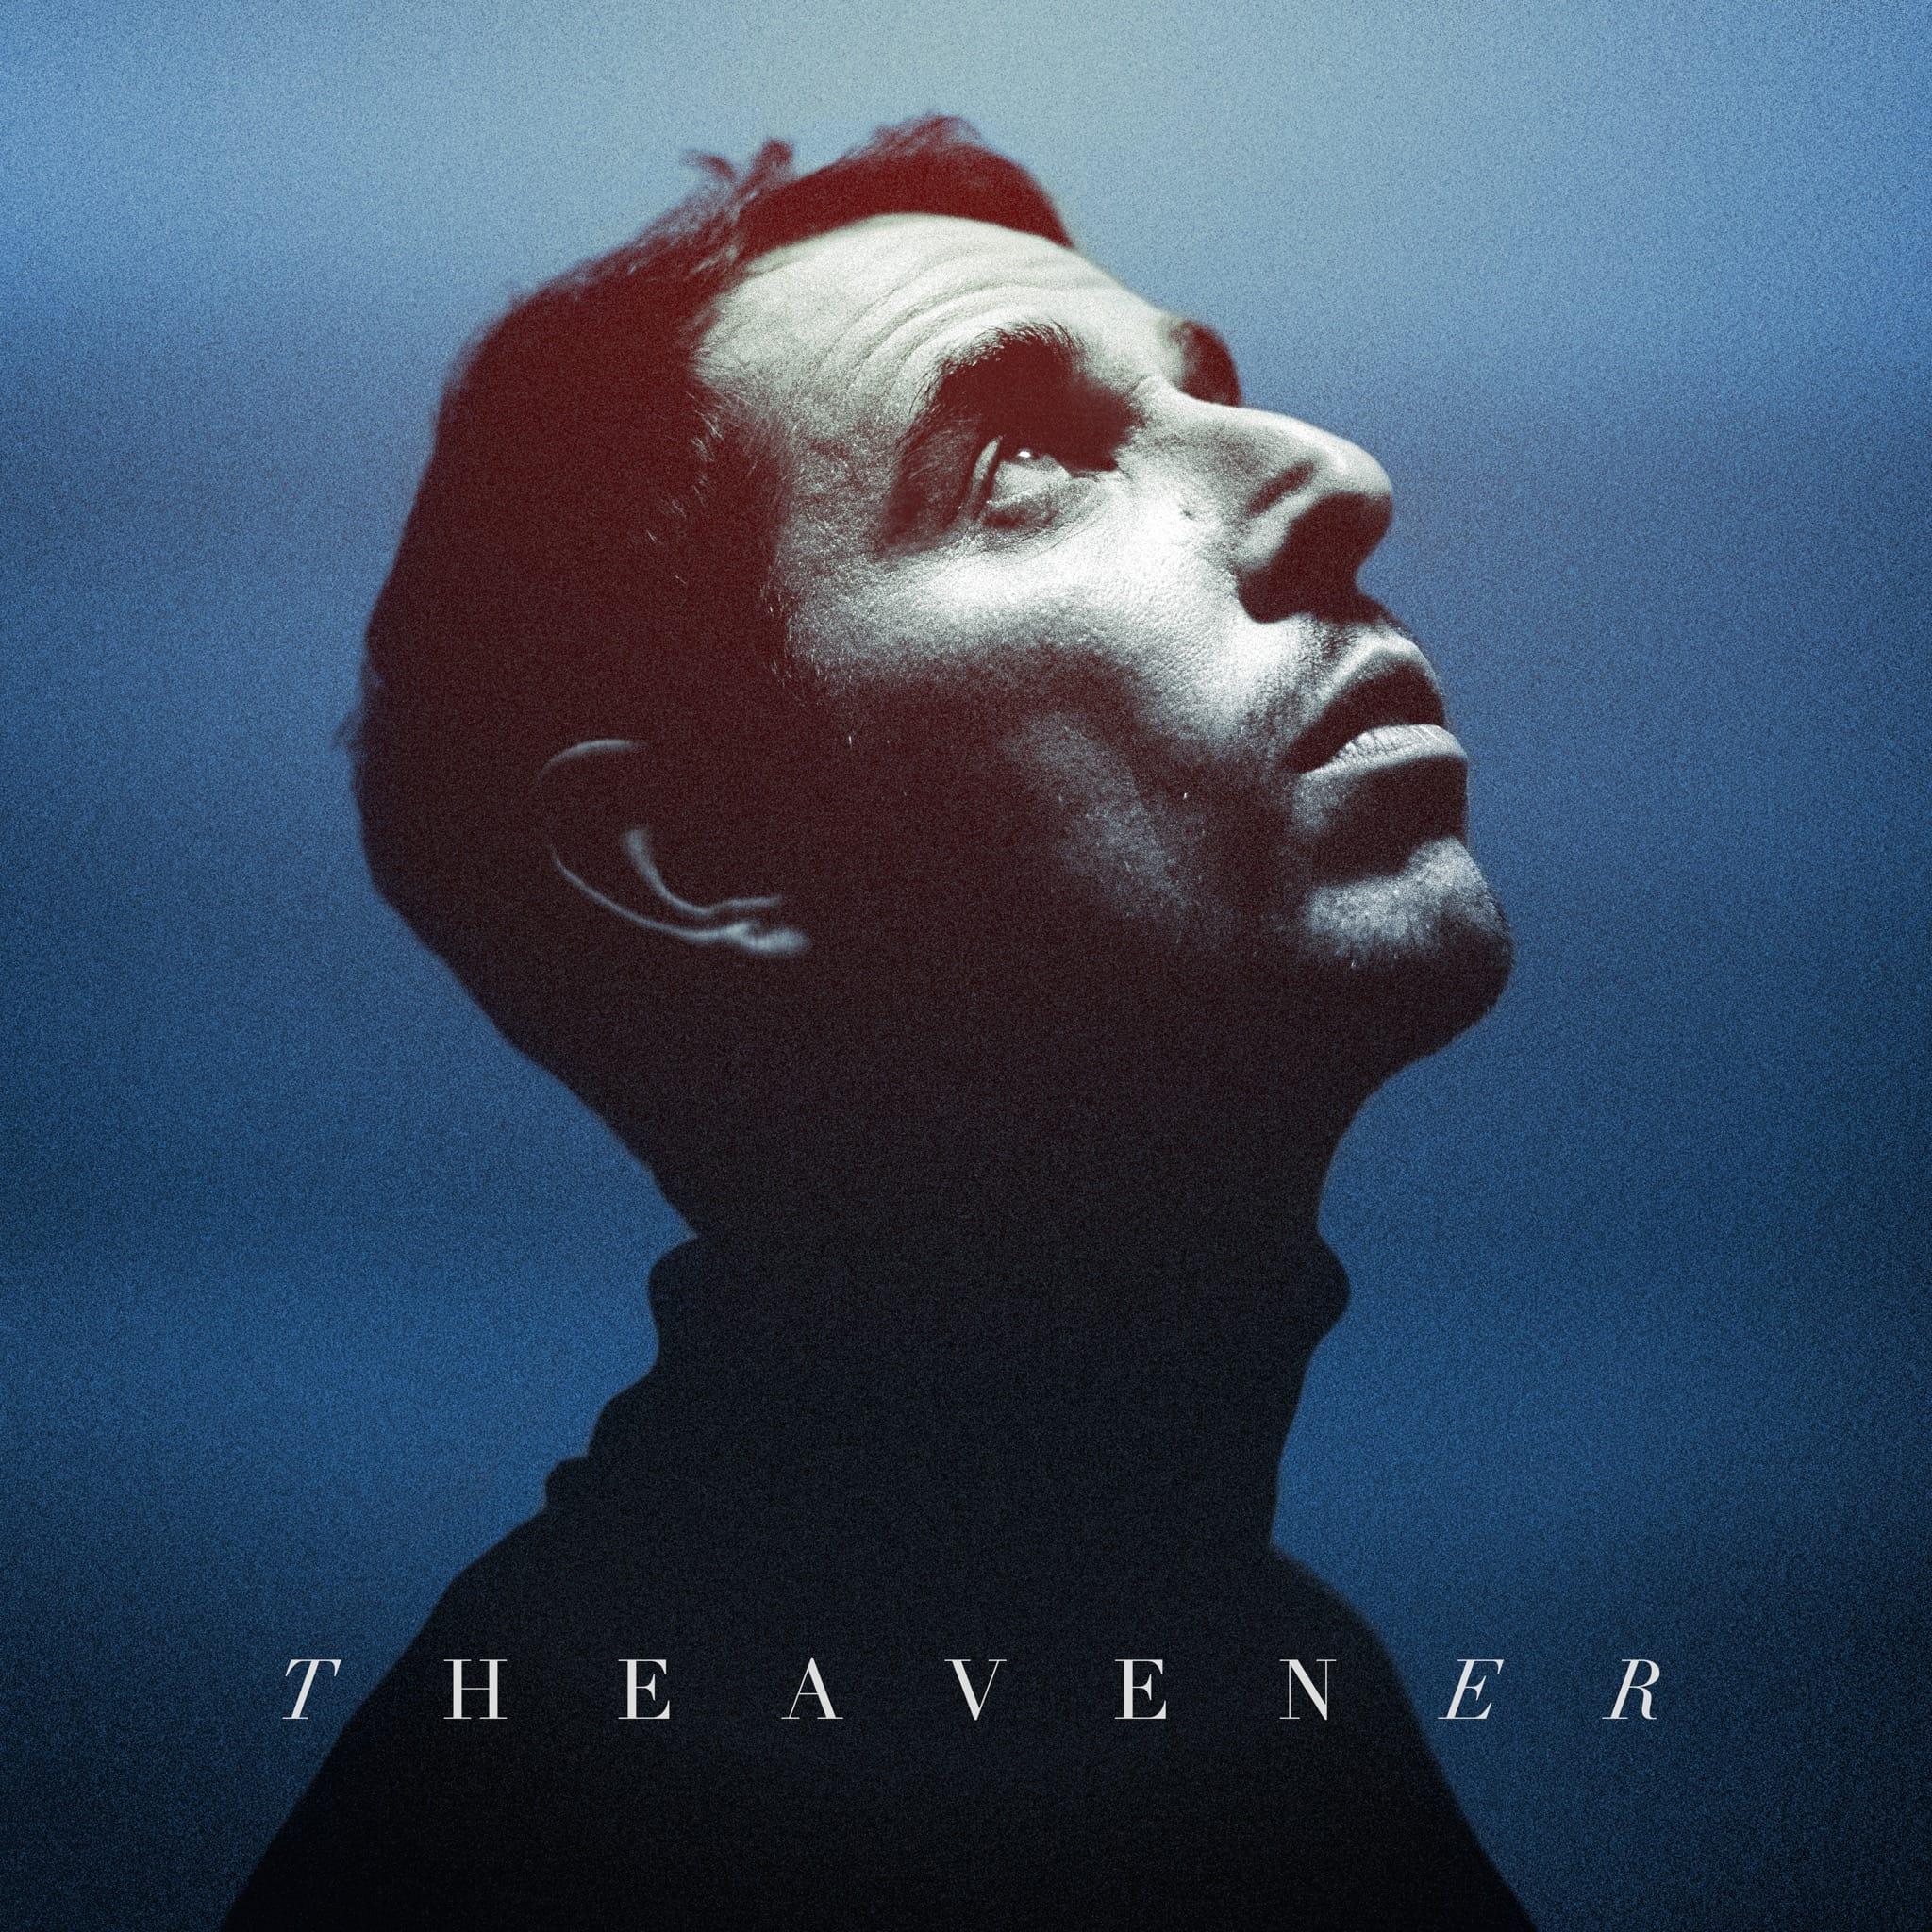 The Avener image pochette cover album heaven musique DJ